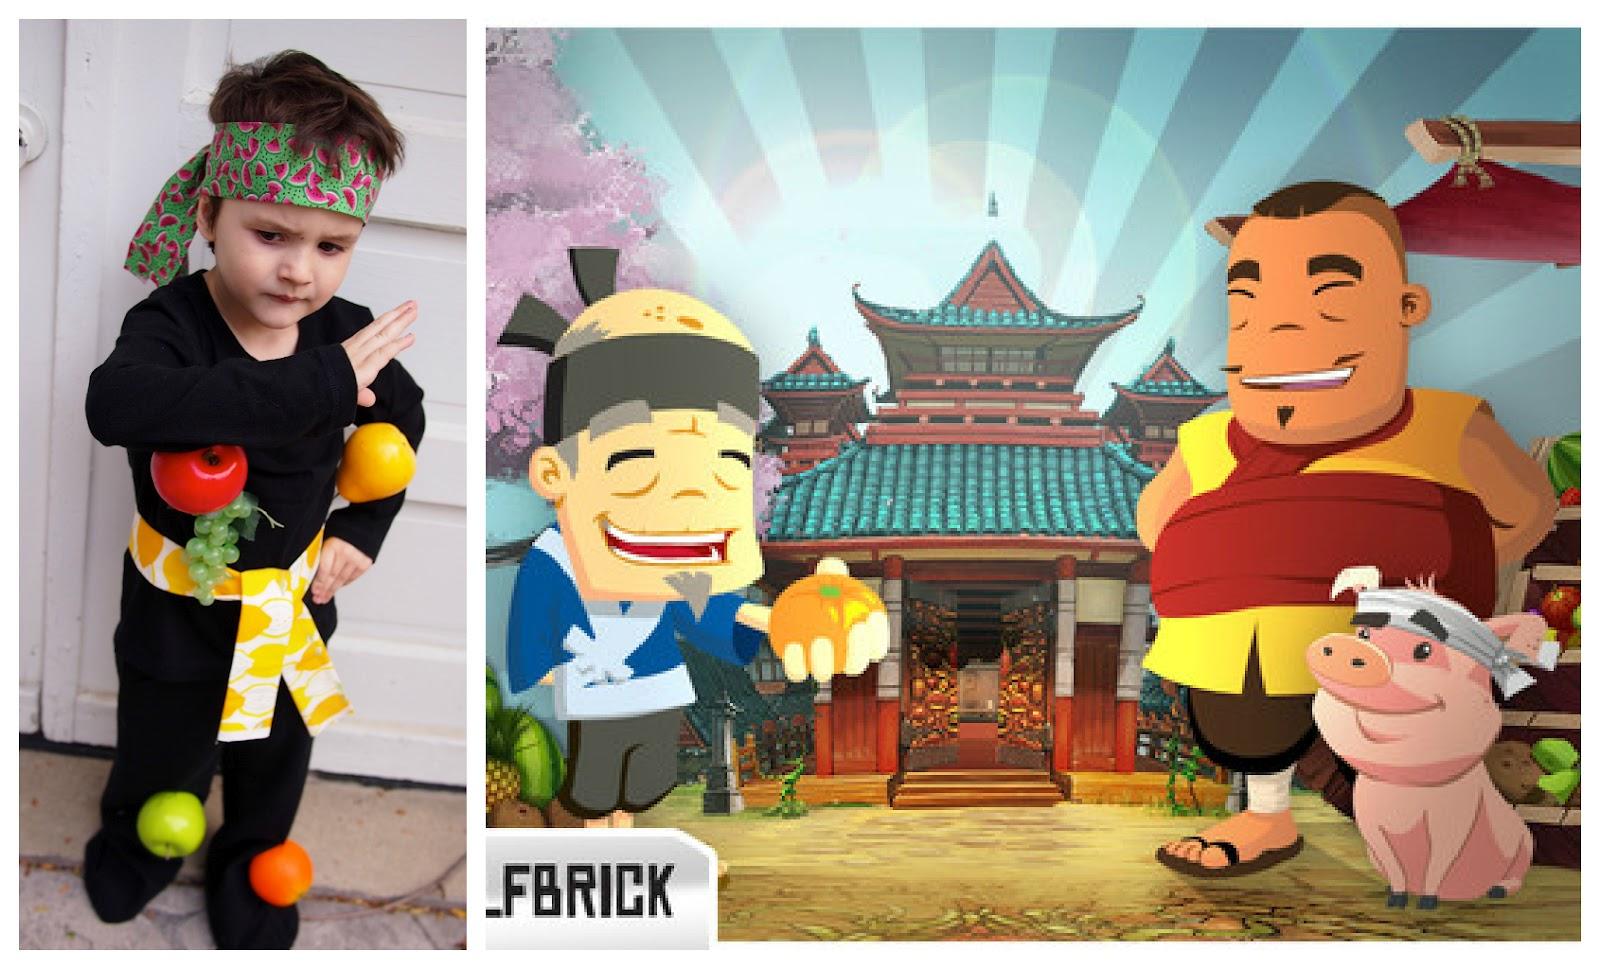 Fruit ninja 5 - Ninja Costume App Inspired Halloween Costumes Jetpack Joyride Fruit